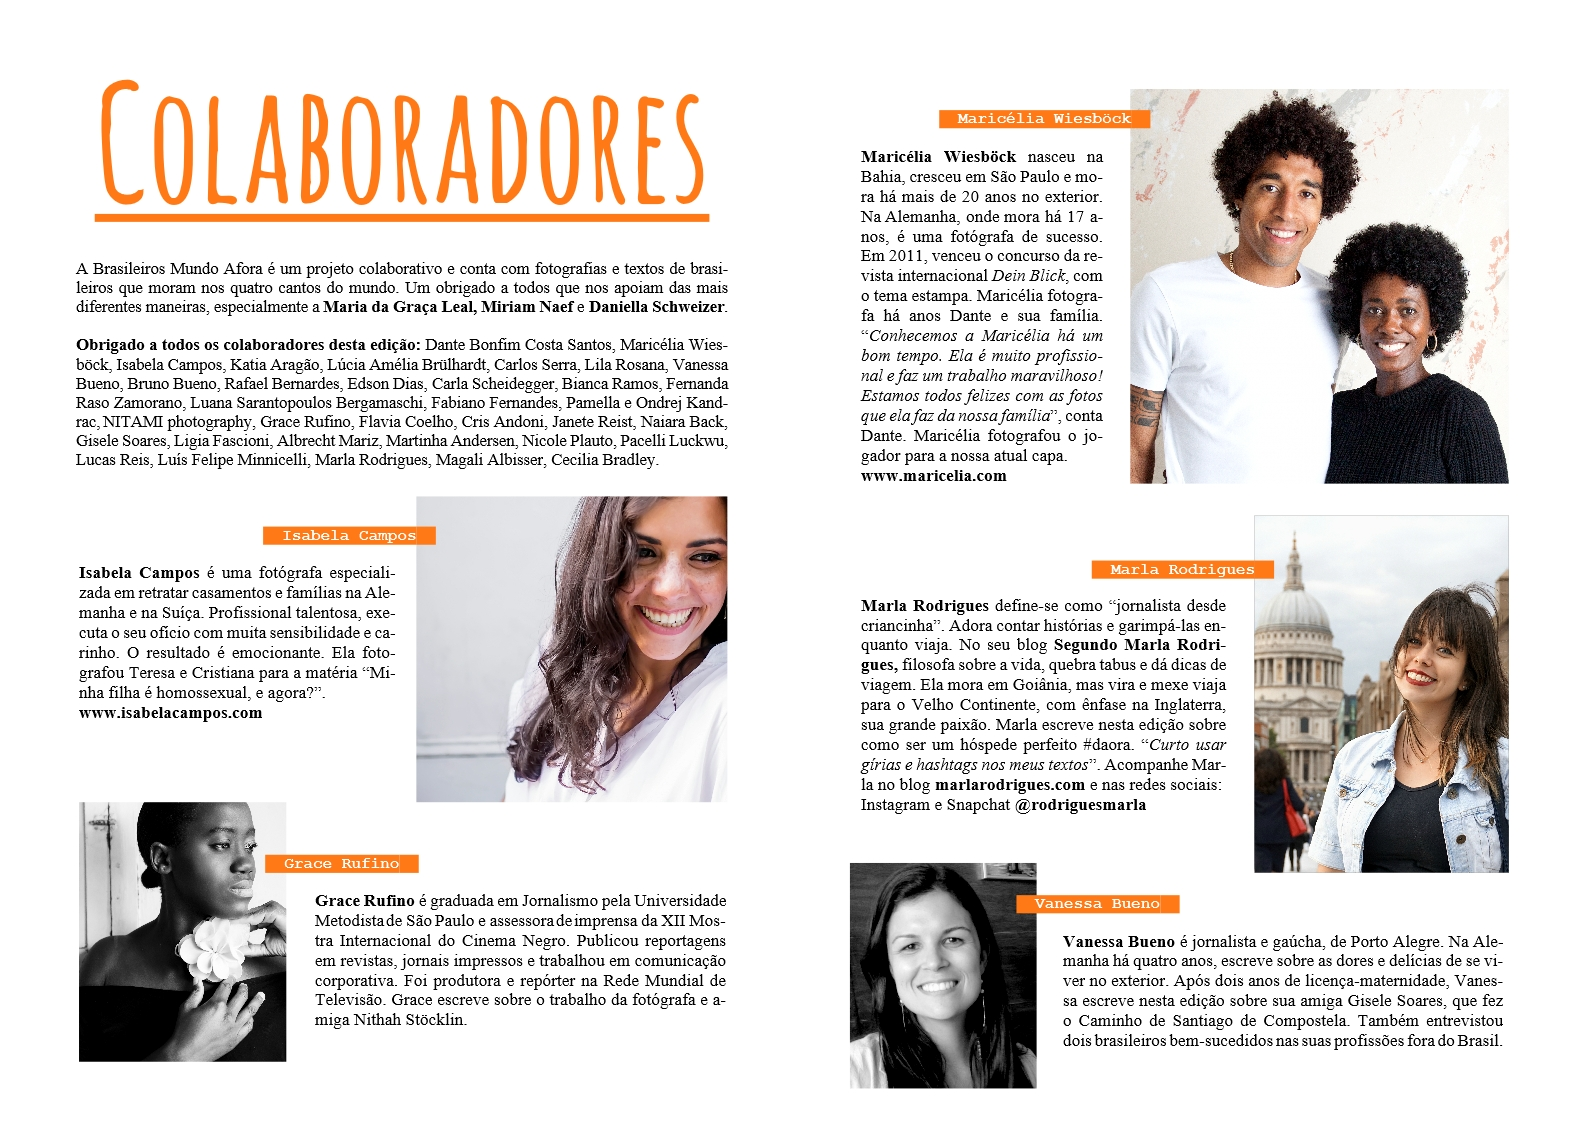 Colaboradores da Brasileiros Mundo Afora